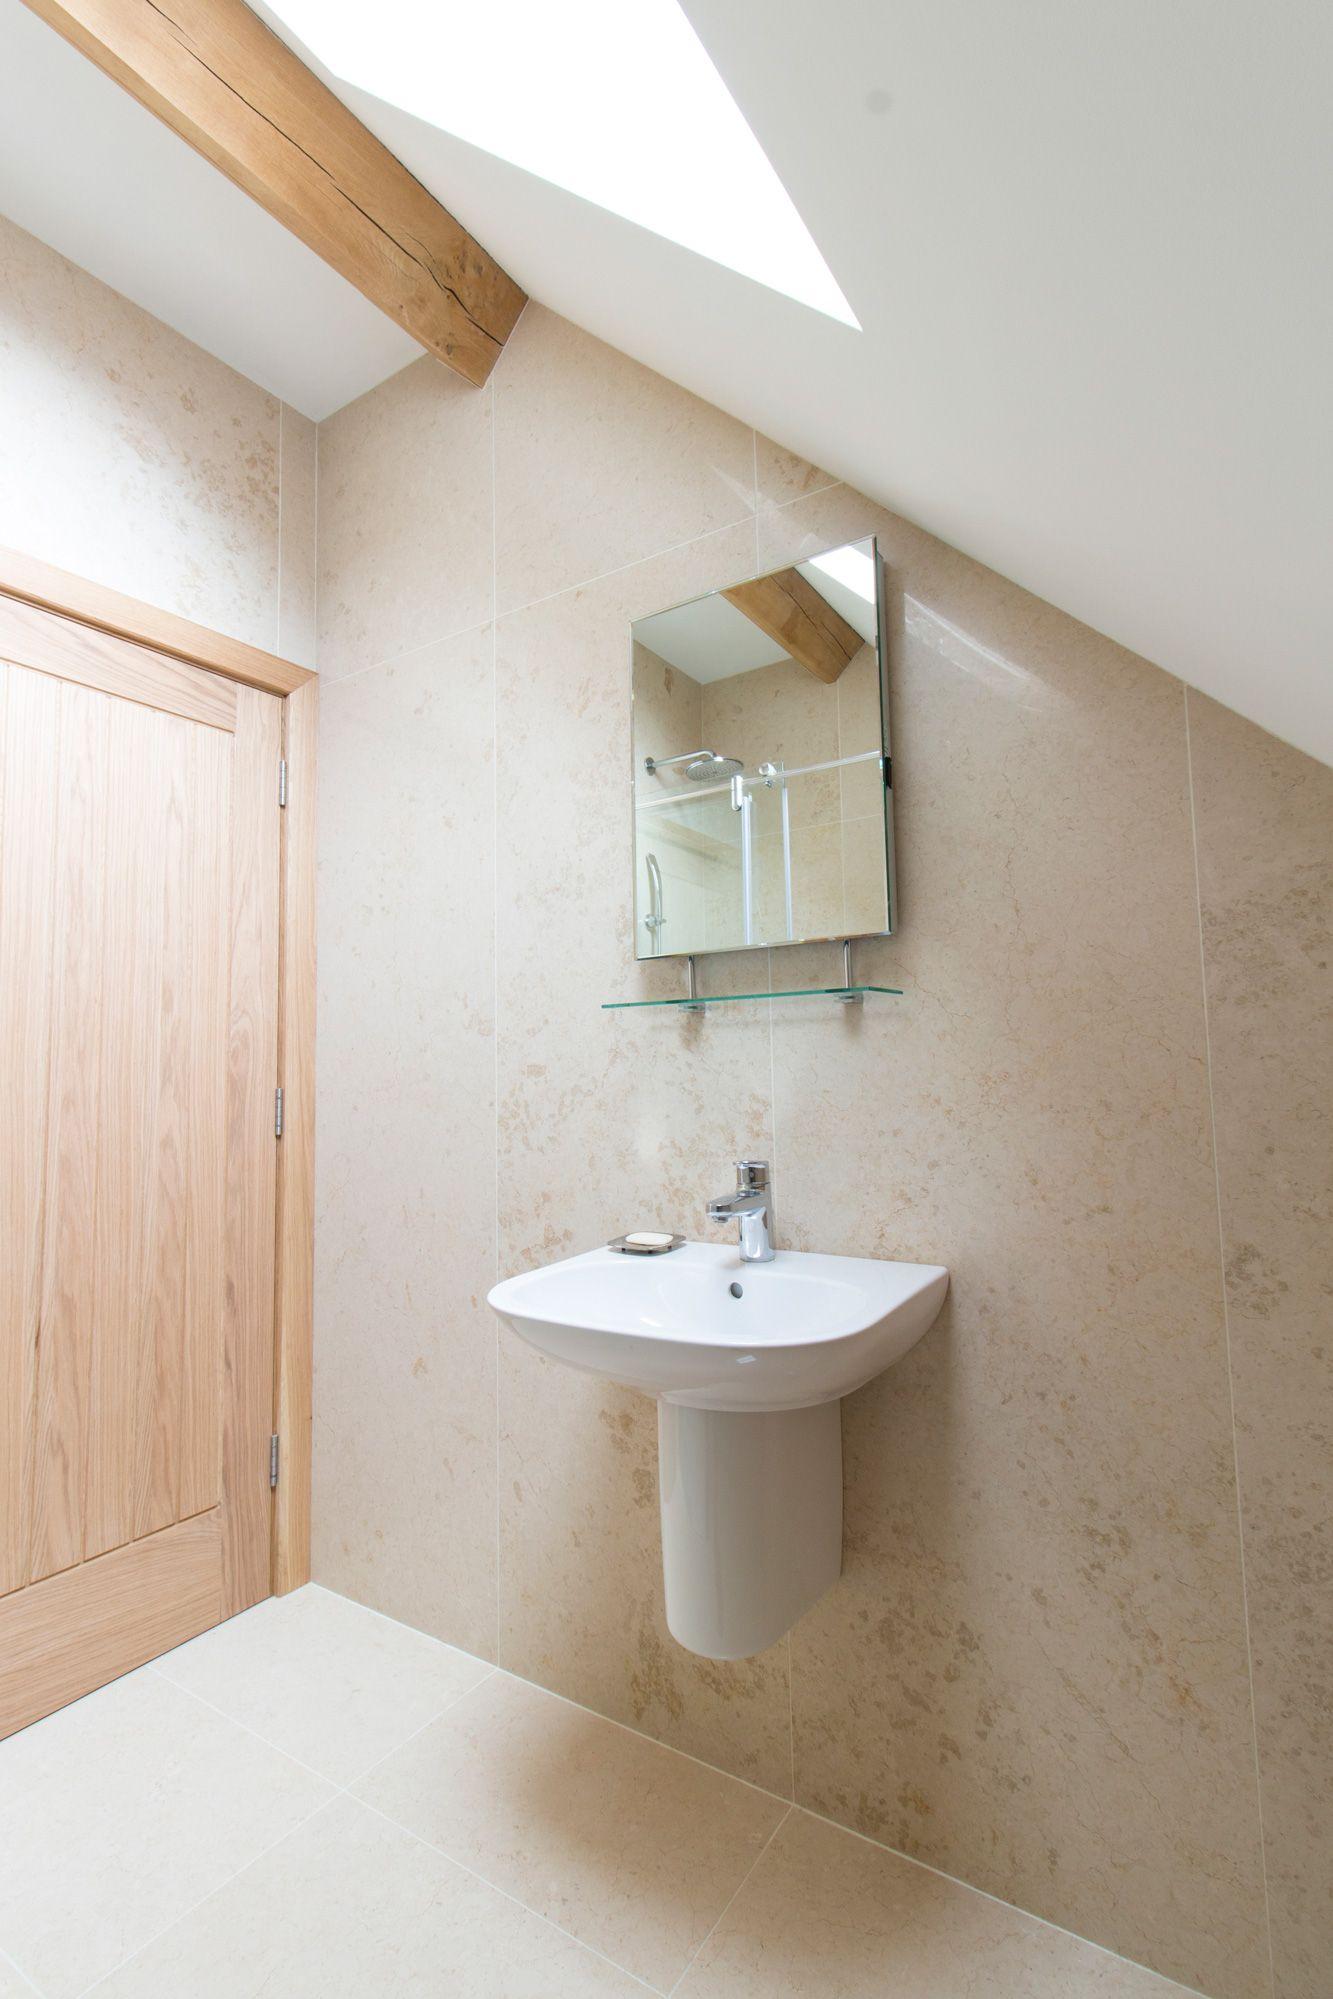 Crema Castello Brushed Limestone Bathroom Tiles | www.mystonefloor ...